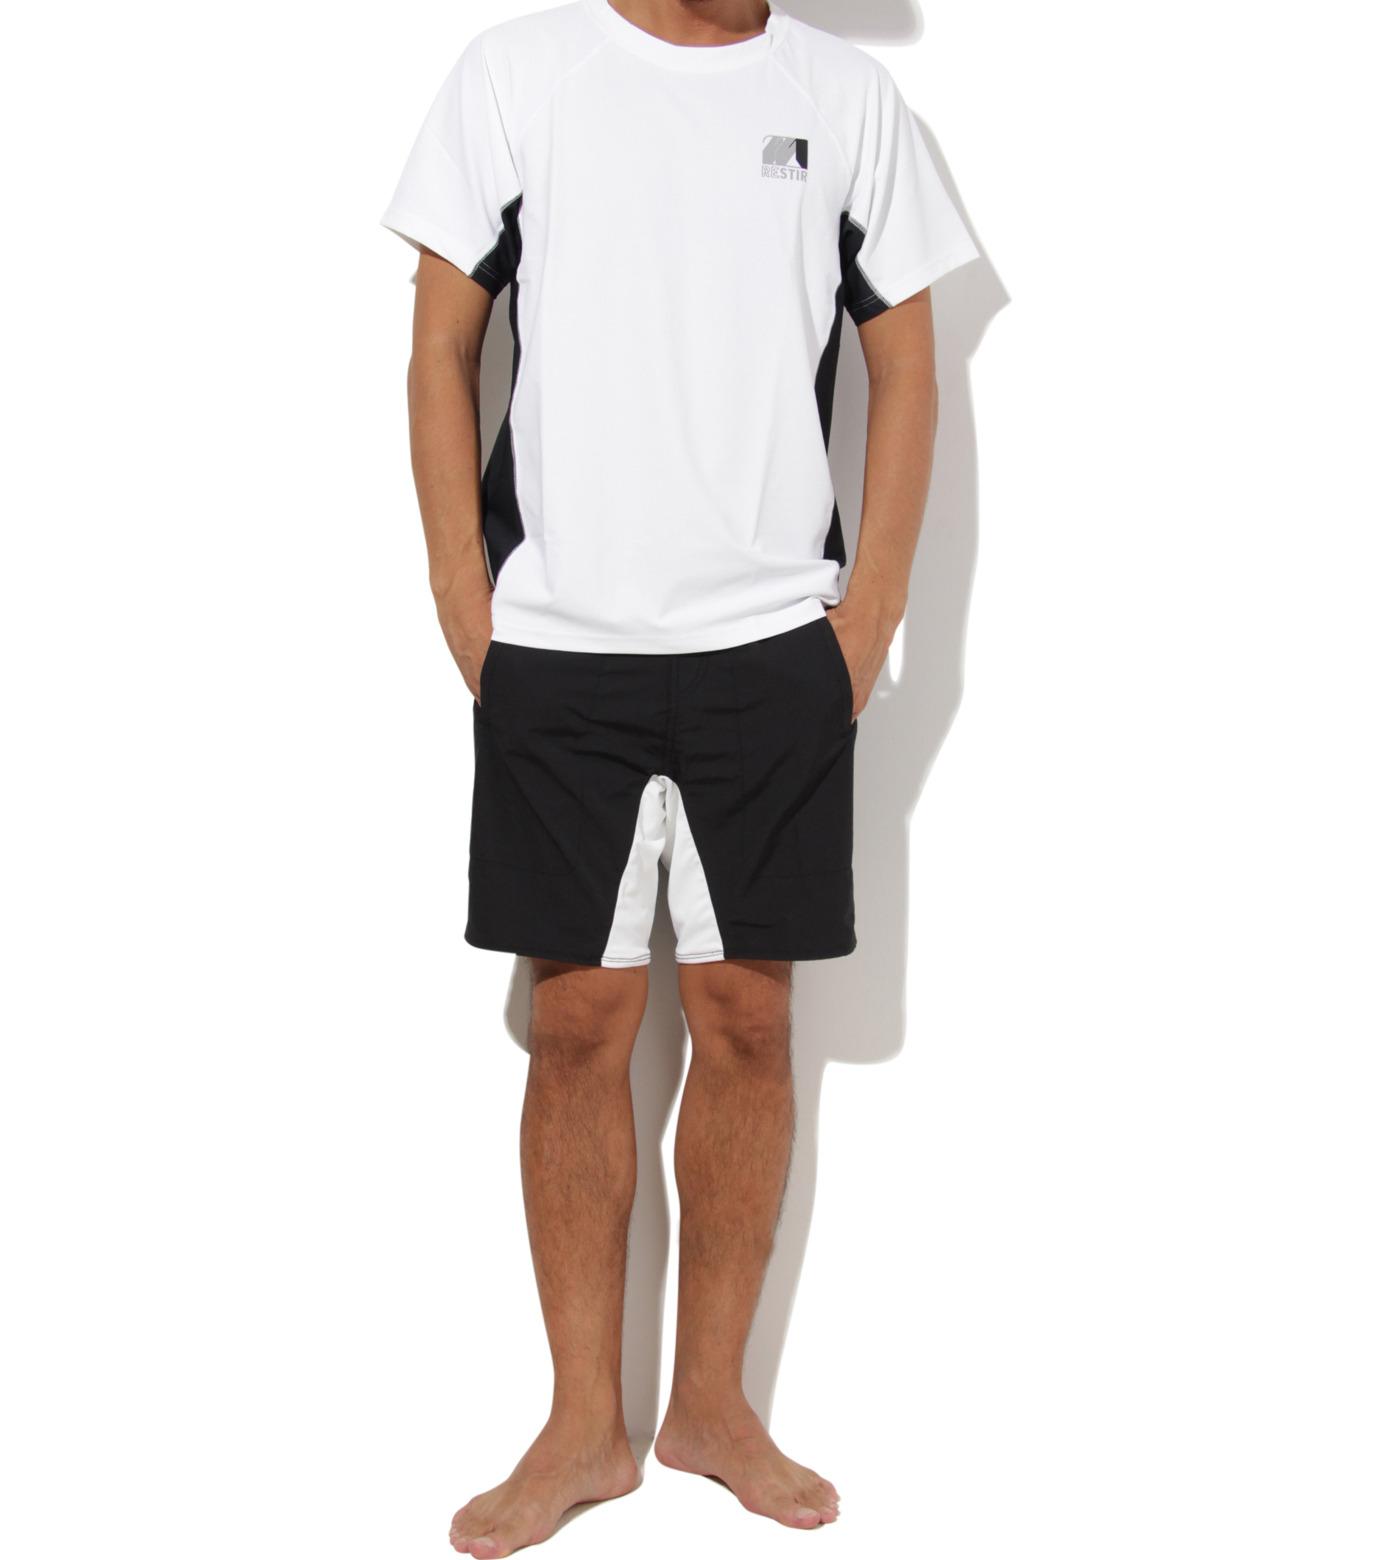 TWO TWO ONE(トゥートゥーワン)のSurf shorts short-WHITE(SWIMWEAR/SWIMWEAR)-15N948001-4 拡大詳細画像5